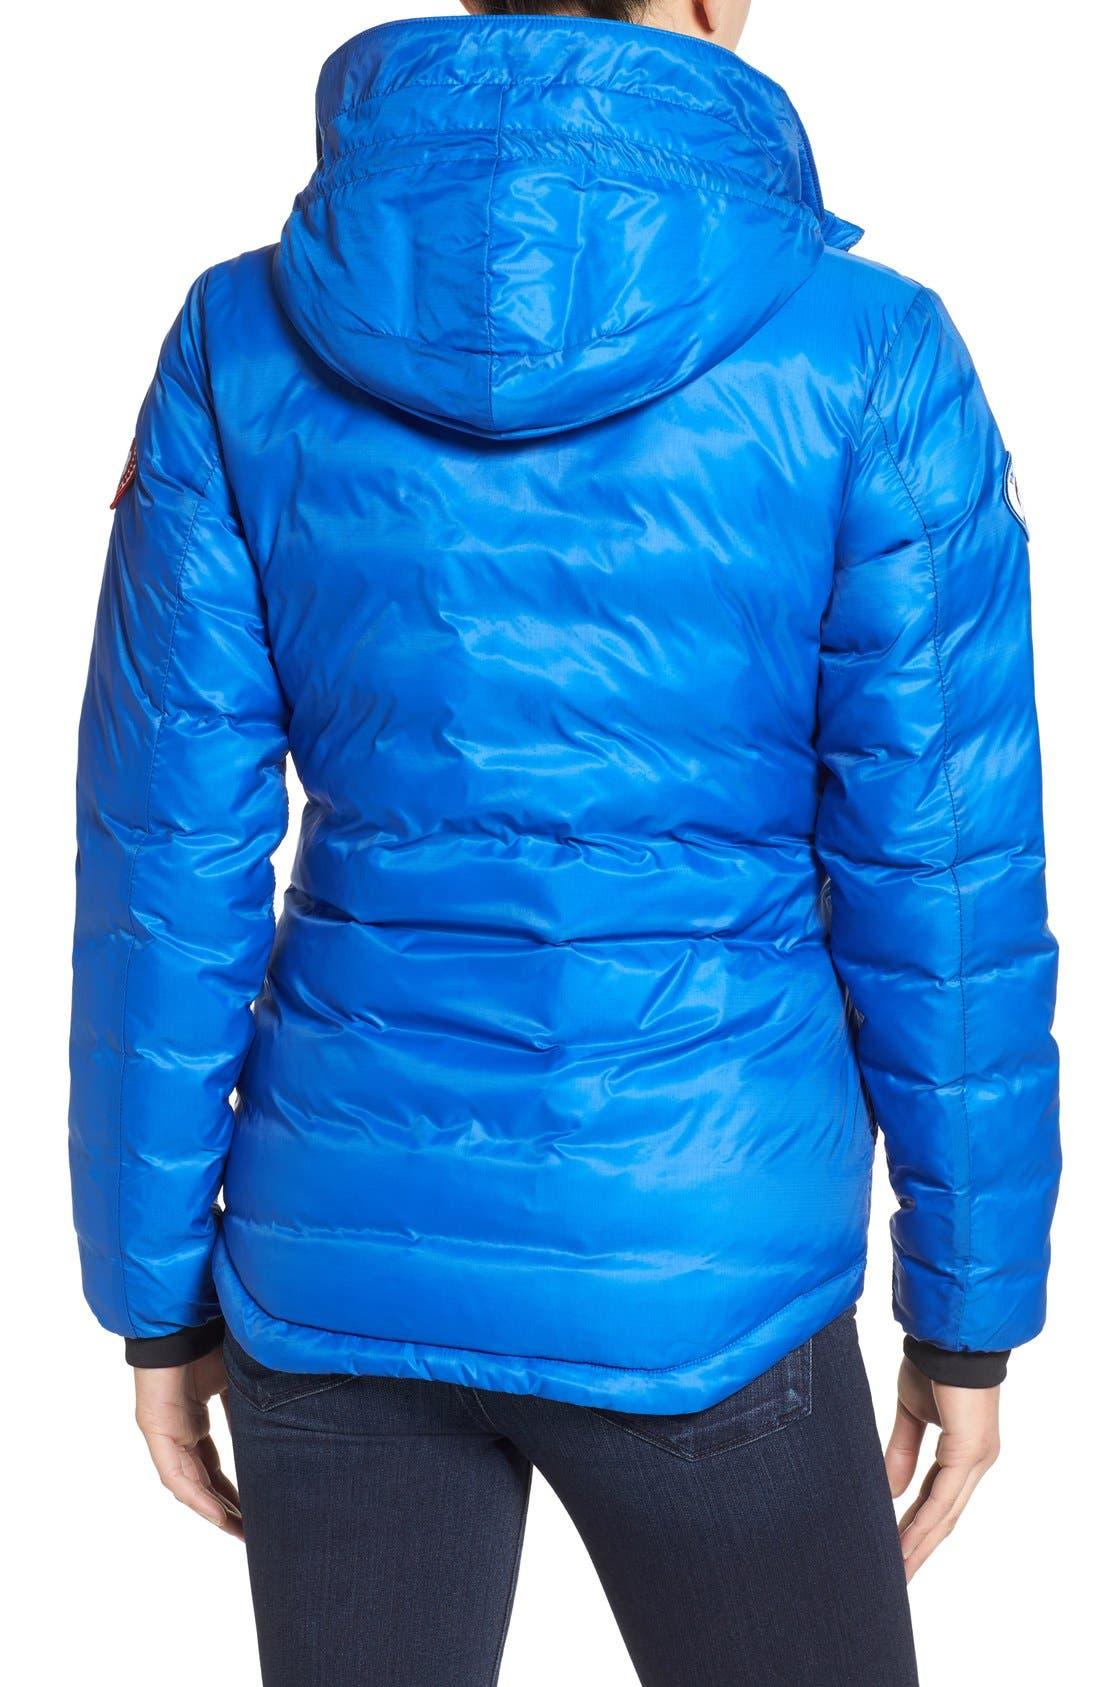 'PBI Camp' Packable Hooded Down Jacket,                             Alternate thumbnail 4, color,                             ROYAL PBI BLUE